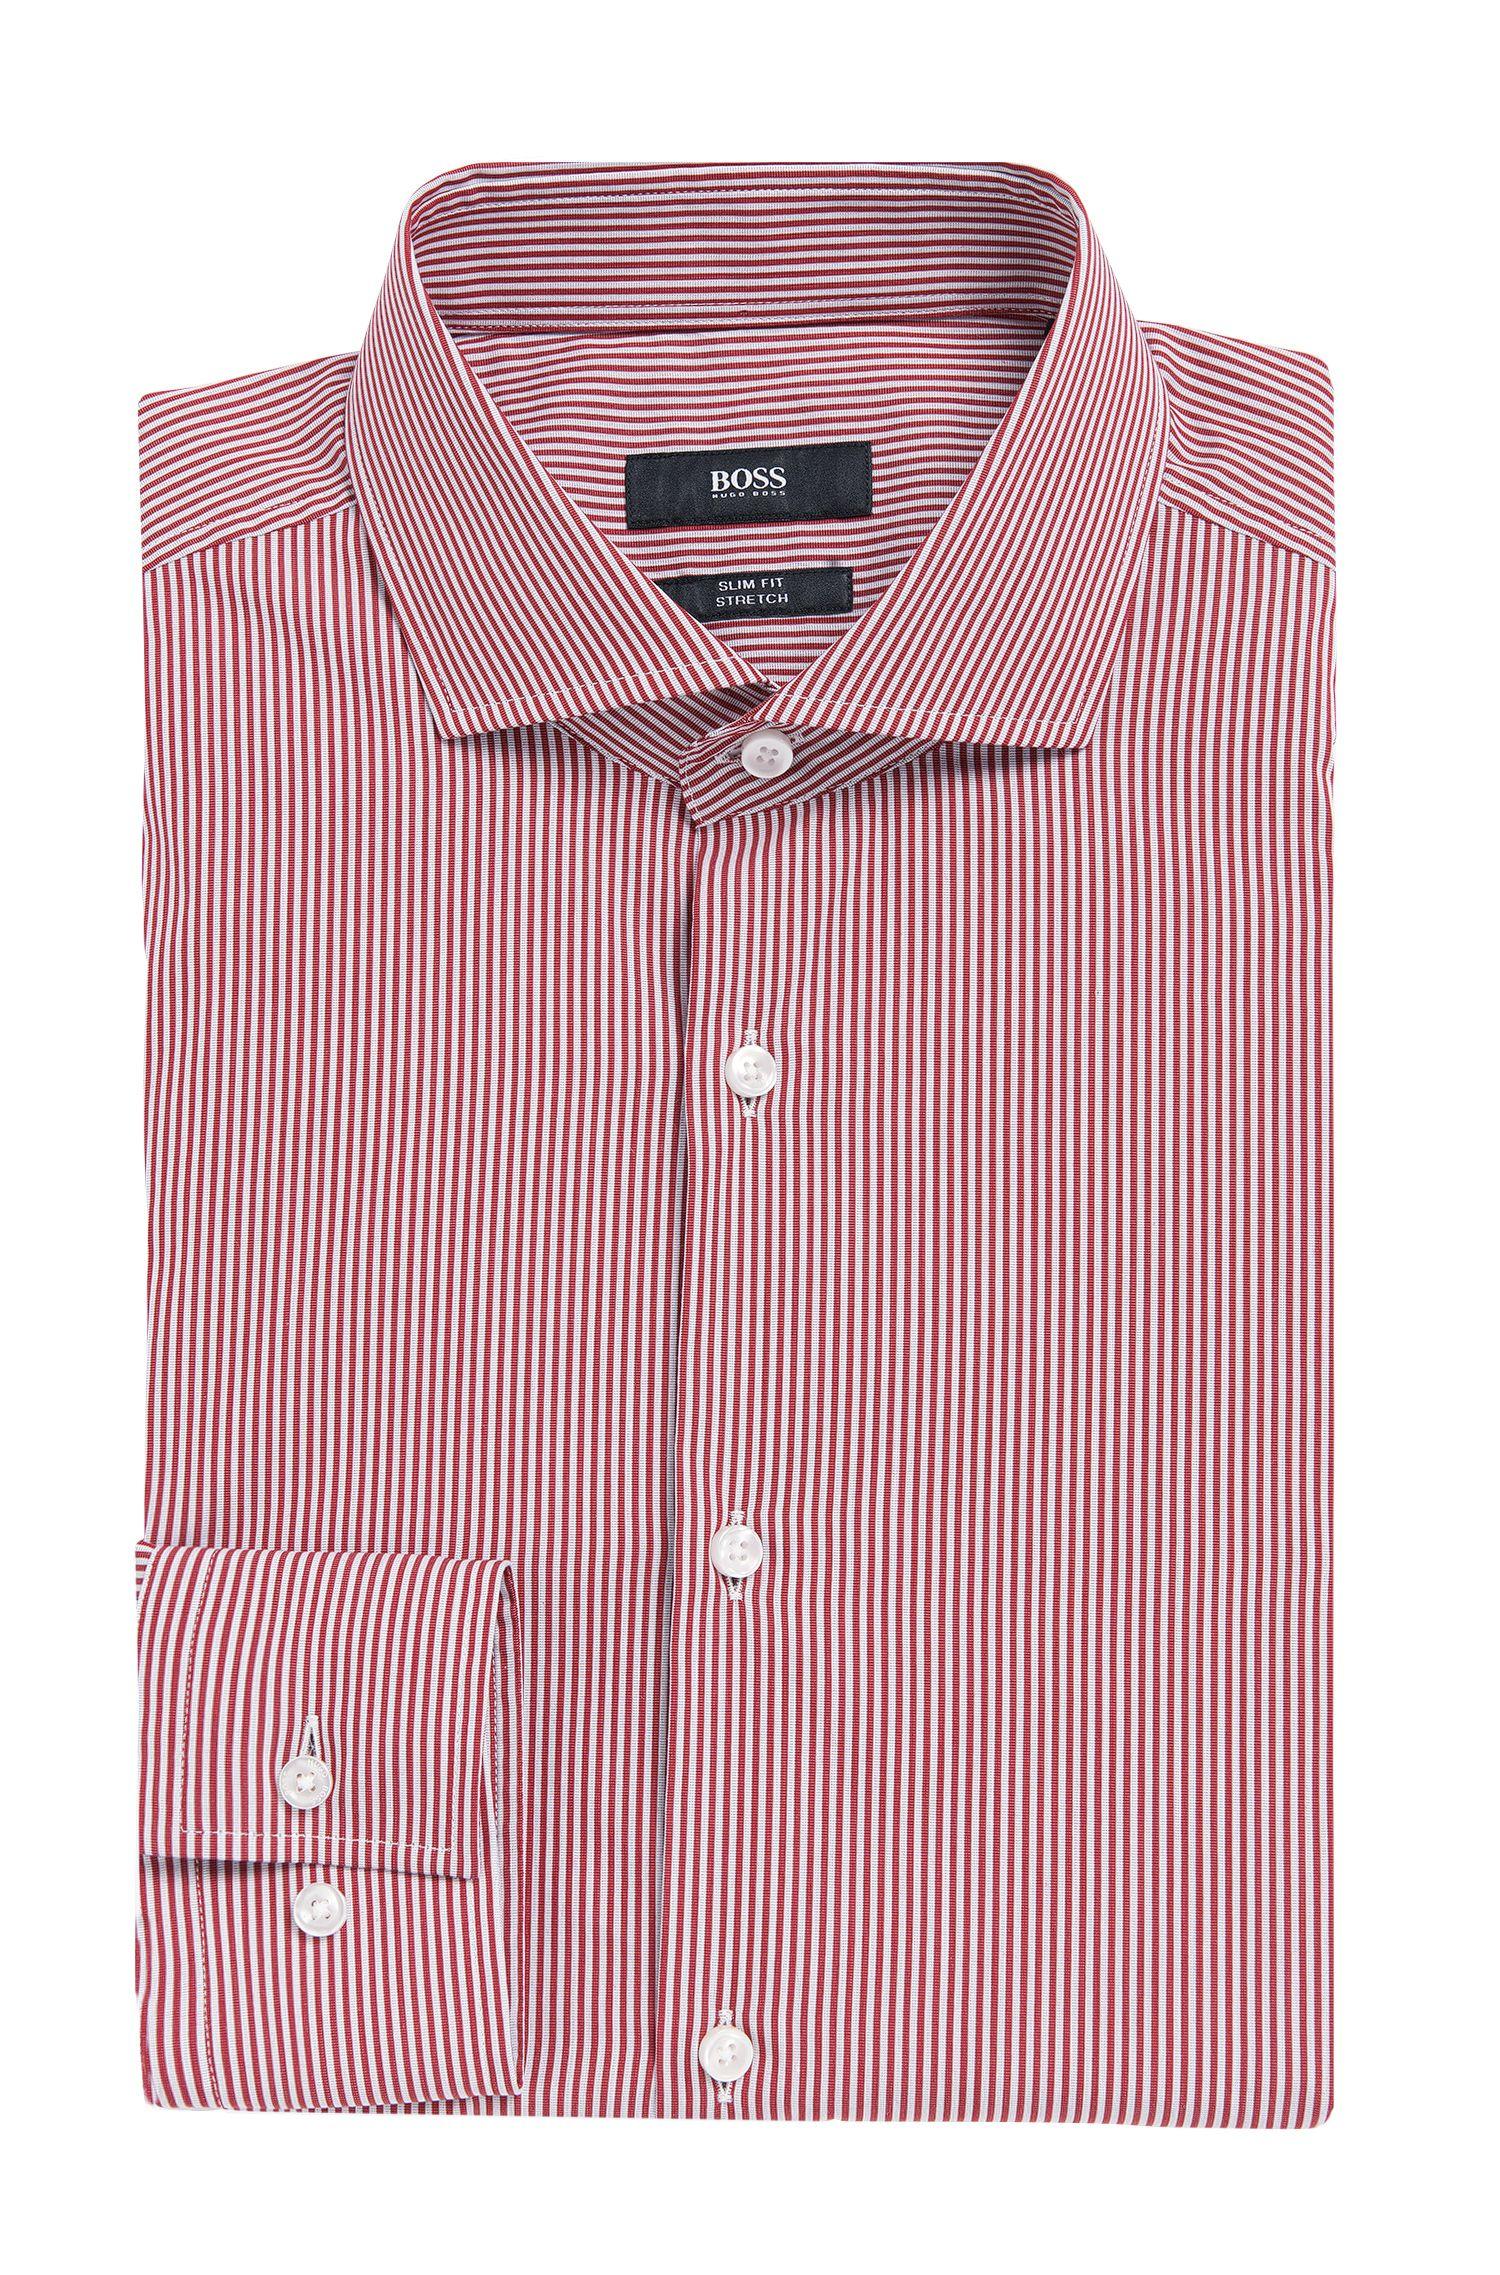 'Jason' | Slim Fit, Stretch Cotton Blend Dress Shirt